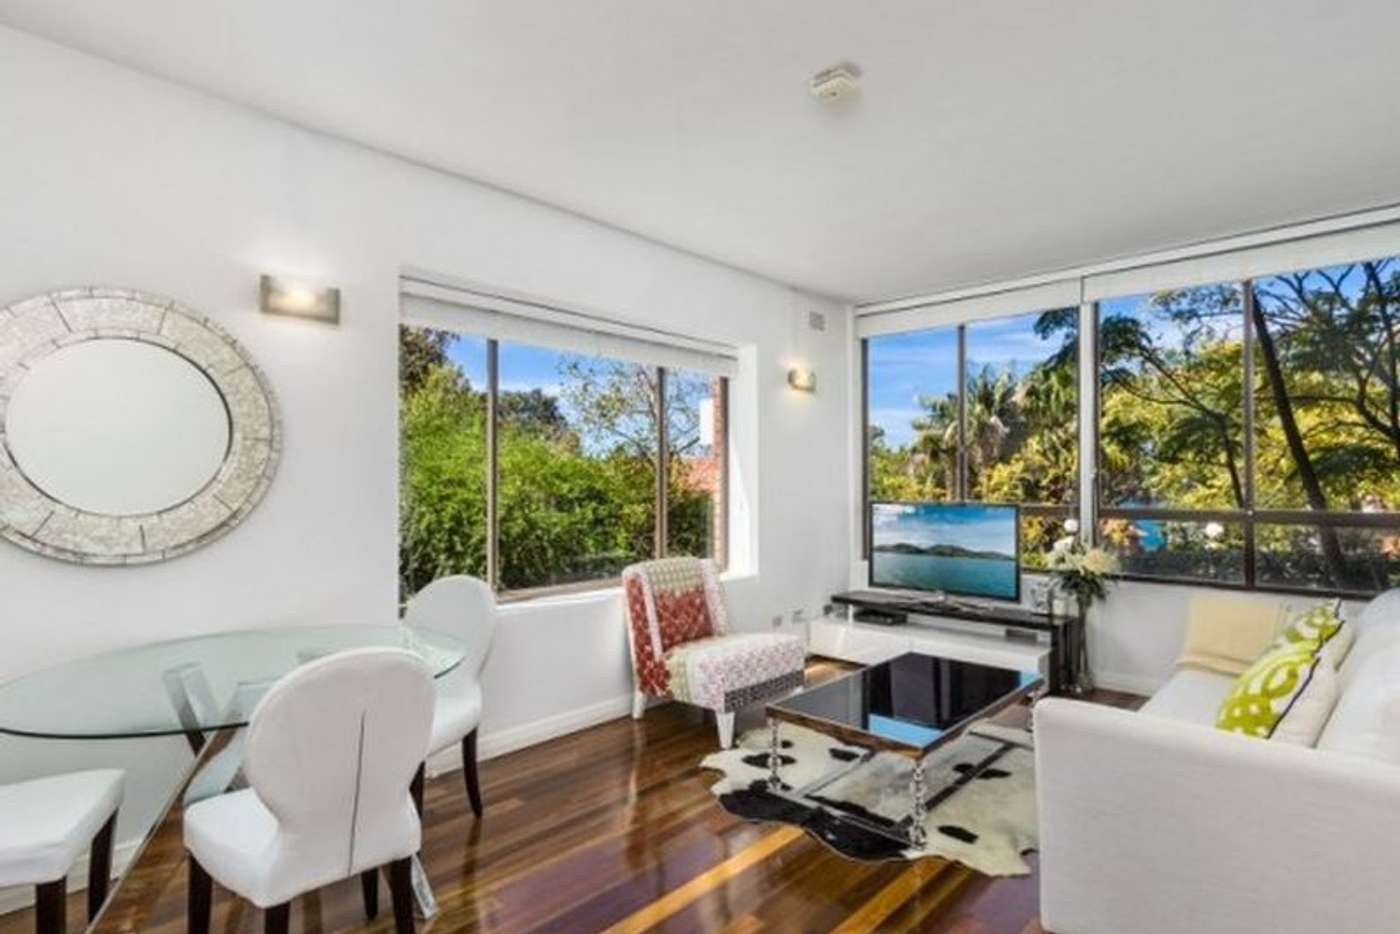 Main view of Homely apartment listing, 2/2 Elamang Avenue, Kirribilli NSW 2061